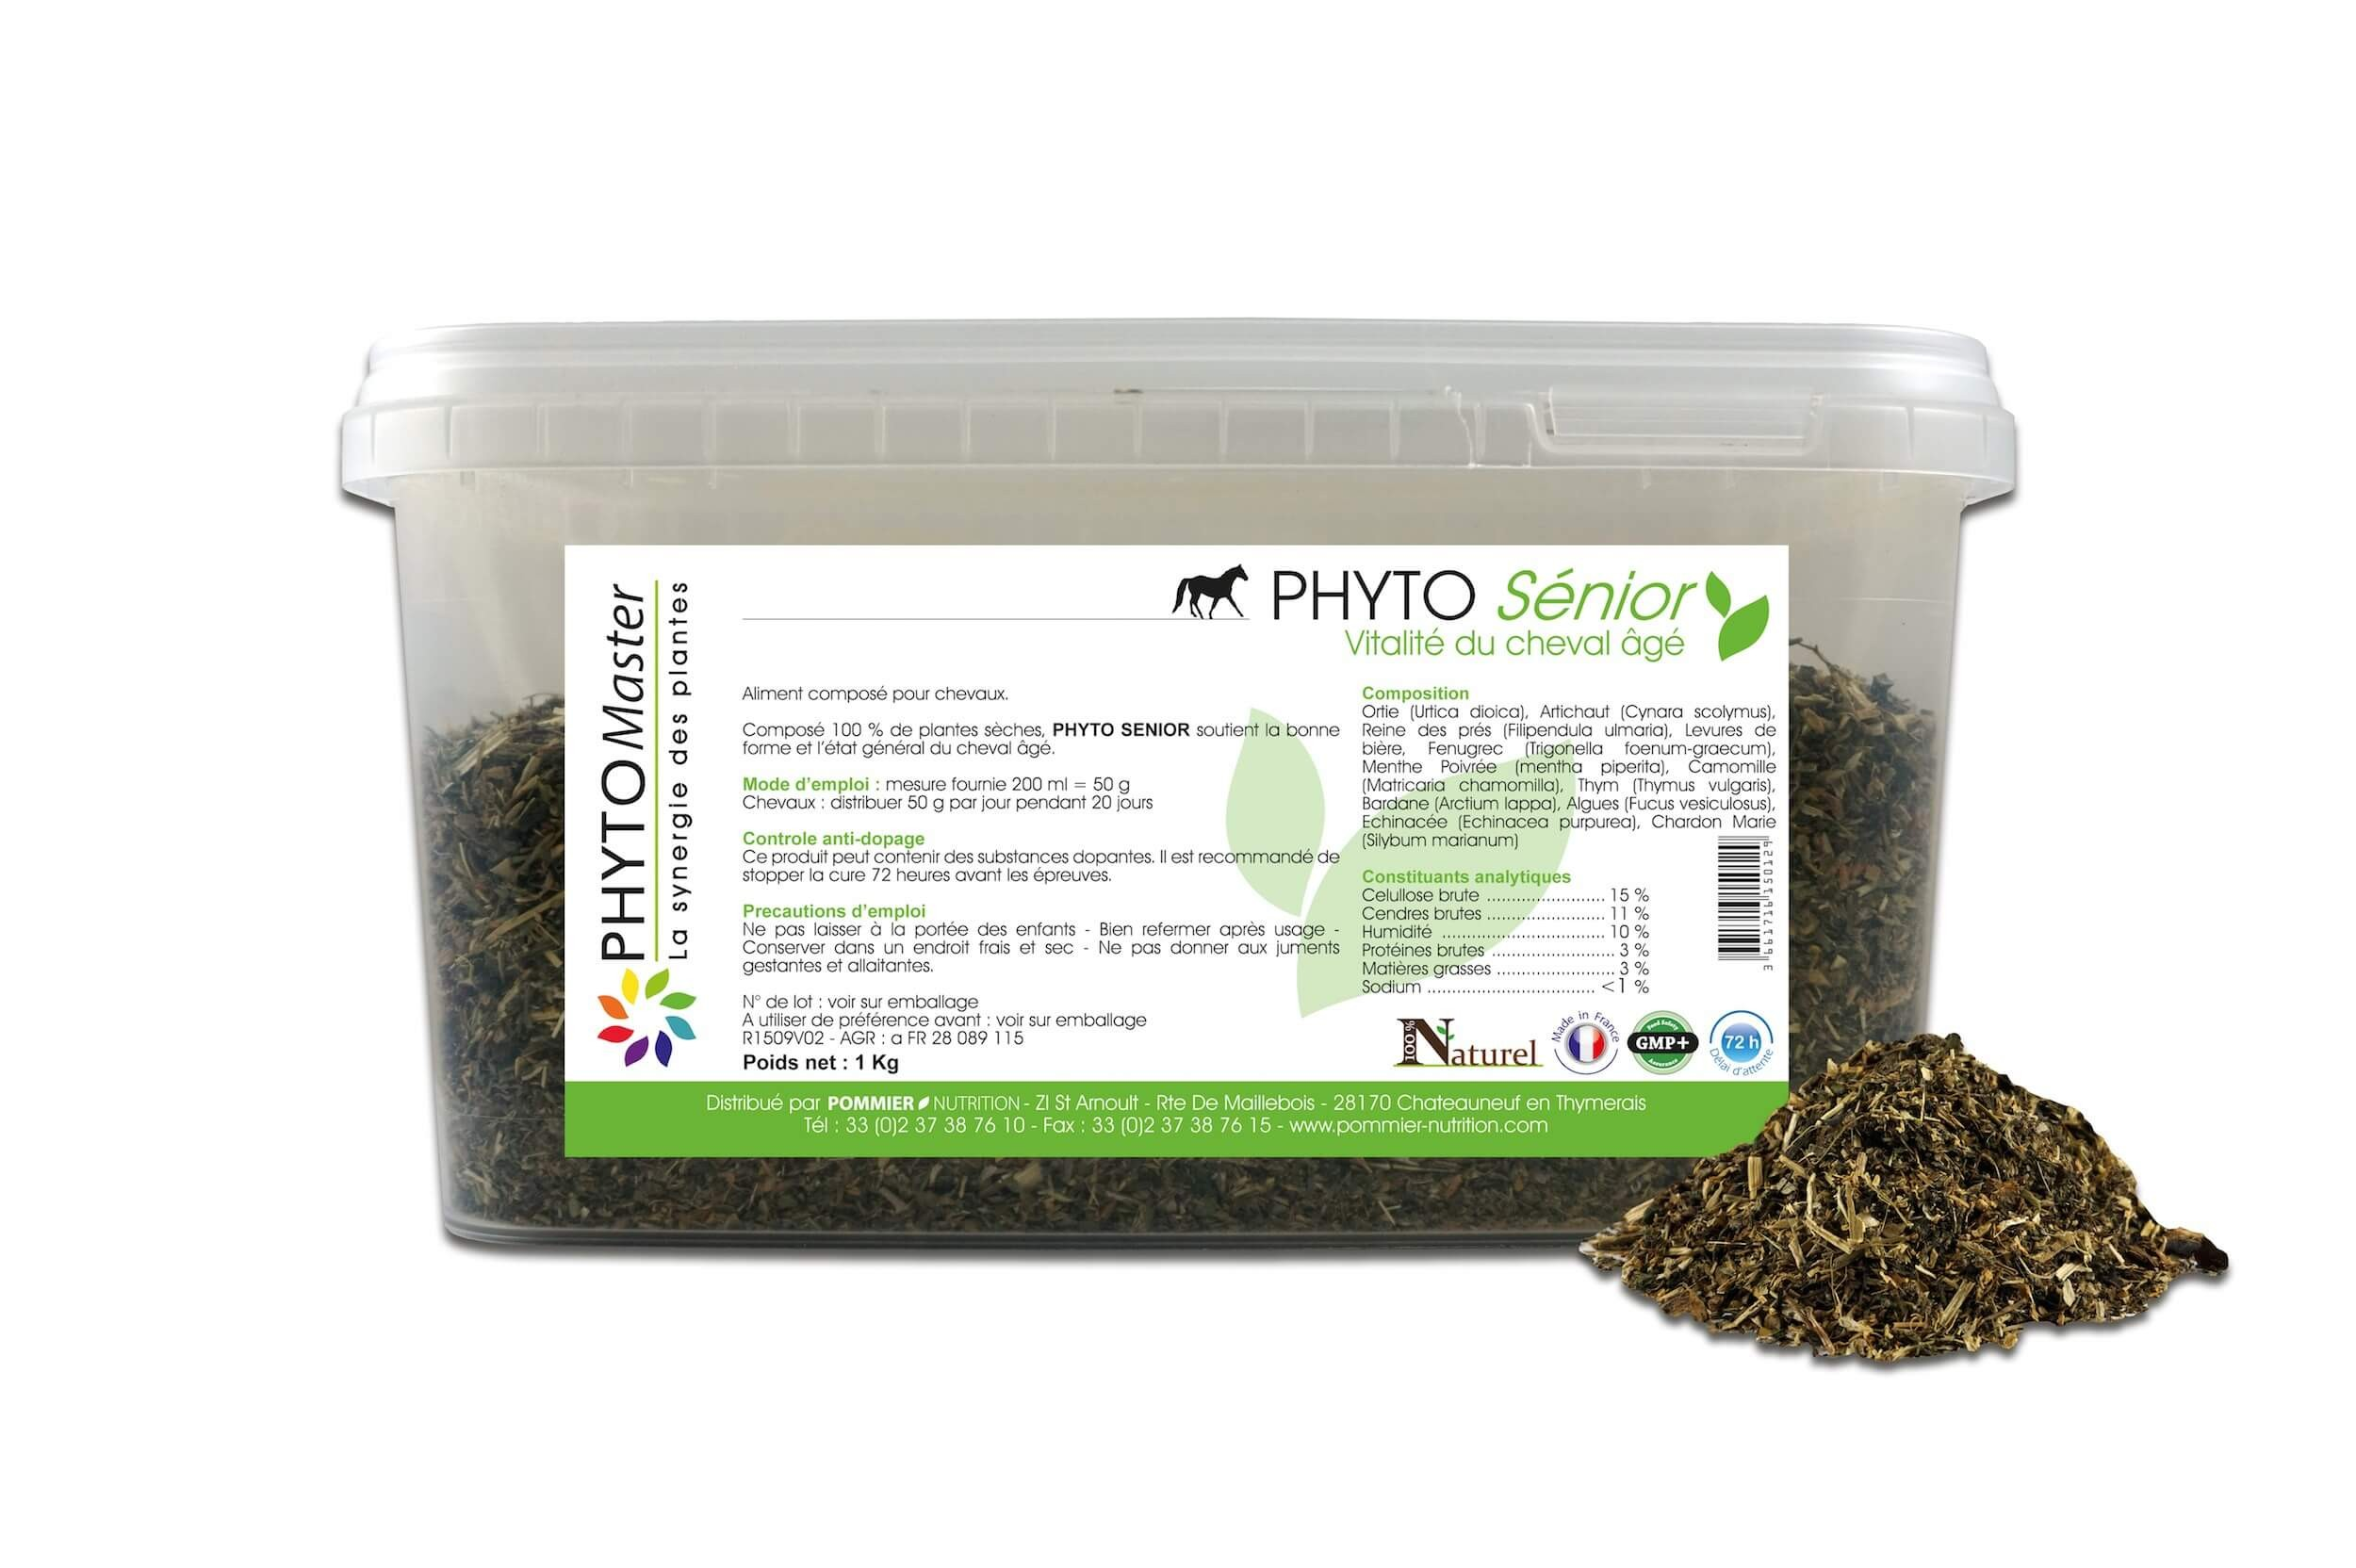 Phyto Master Senior 1 kg - La Compagnie des Animaux